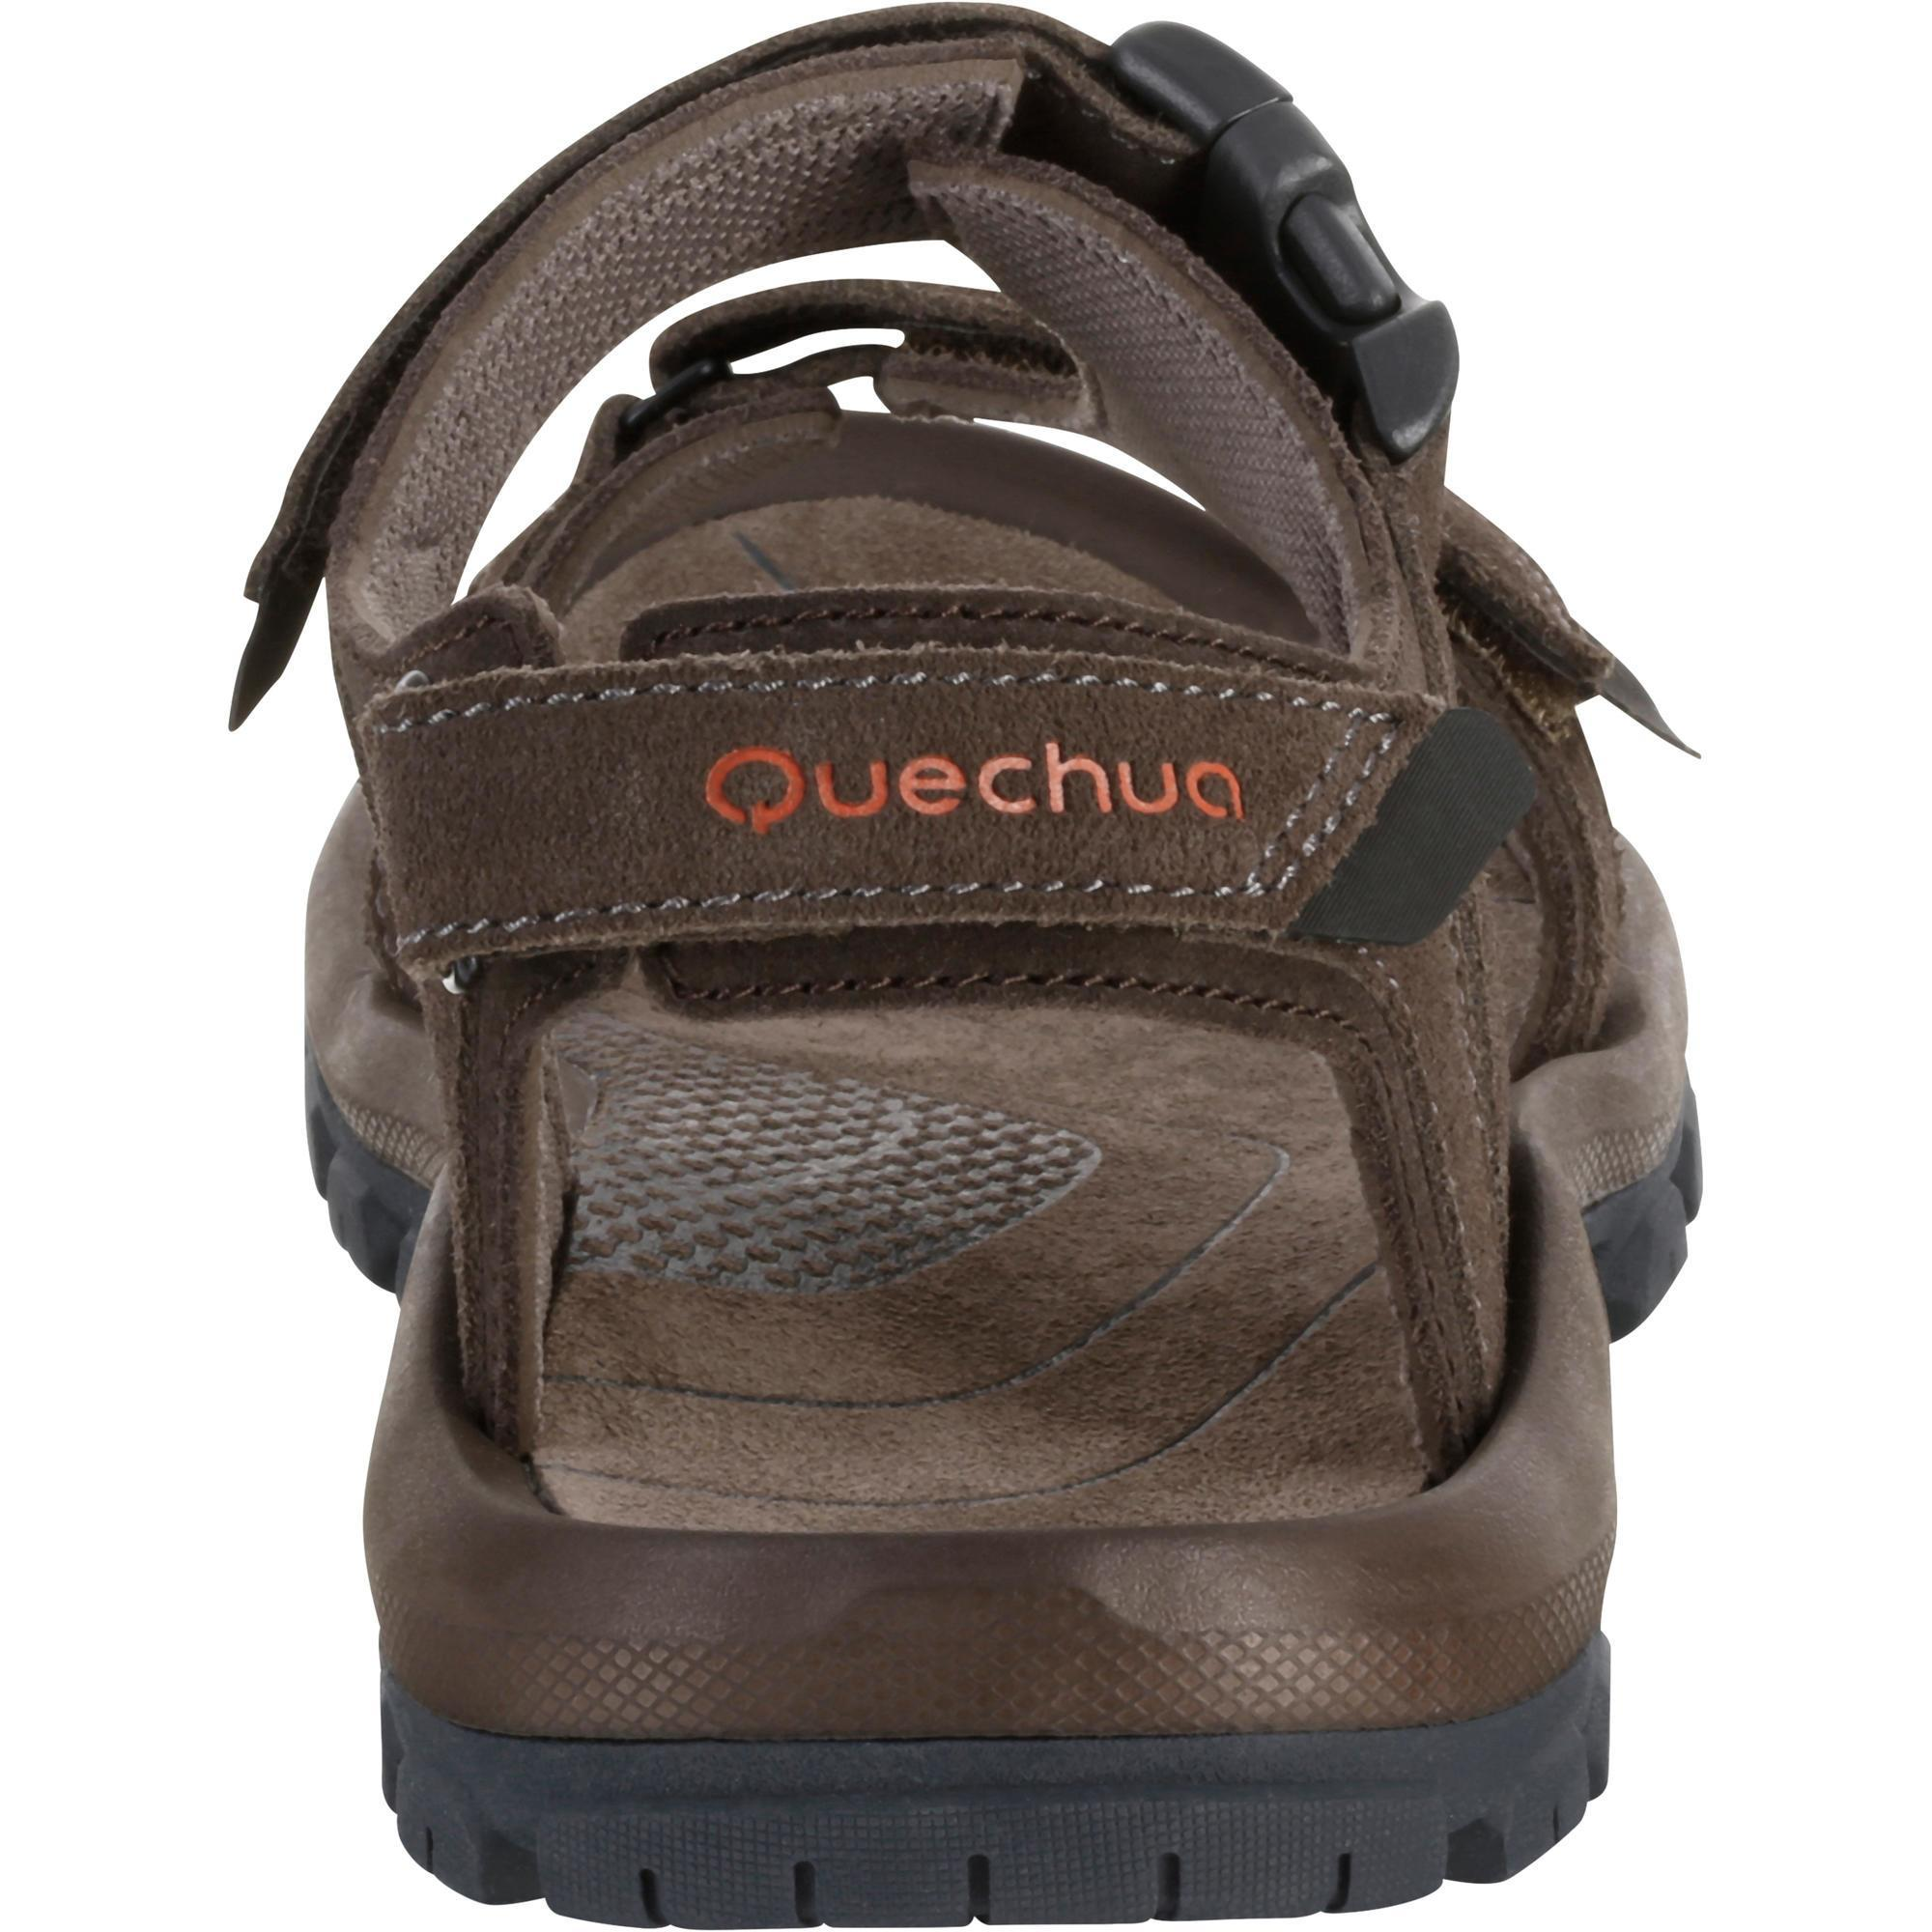 Men's hiking sandal - NH120 - Decathlon